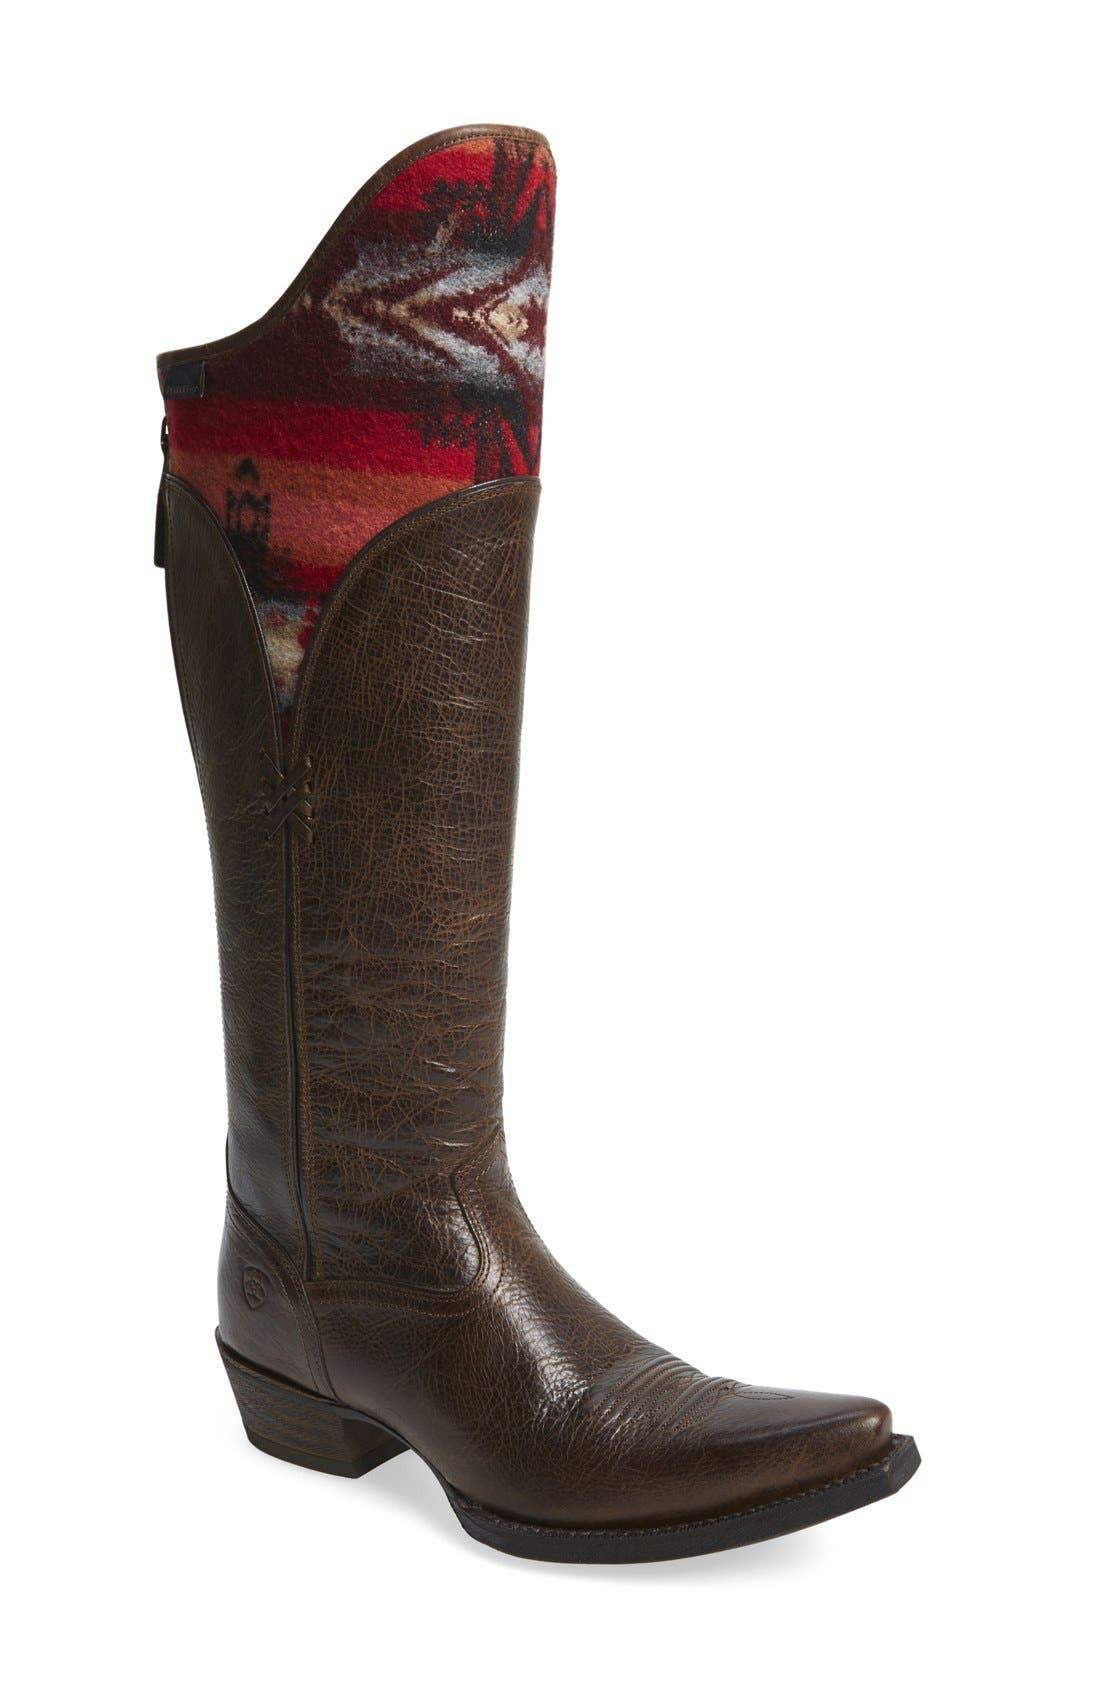 Alternate Image 1 Selected - Ariat 'Caldera' Western Boot (Women)